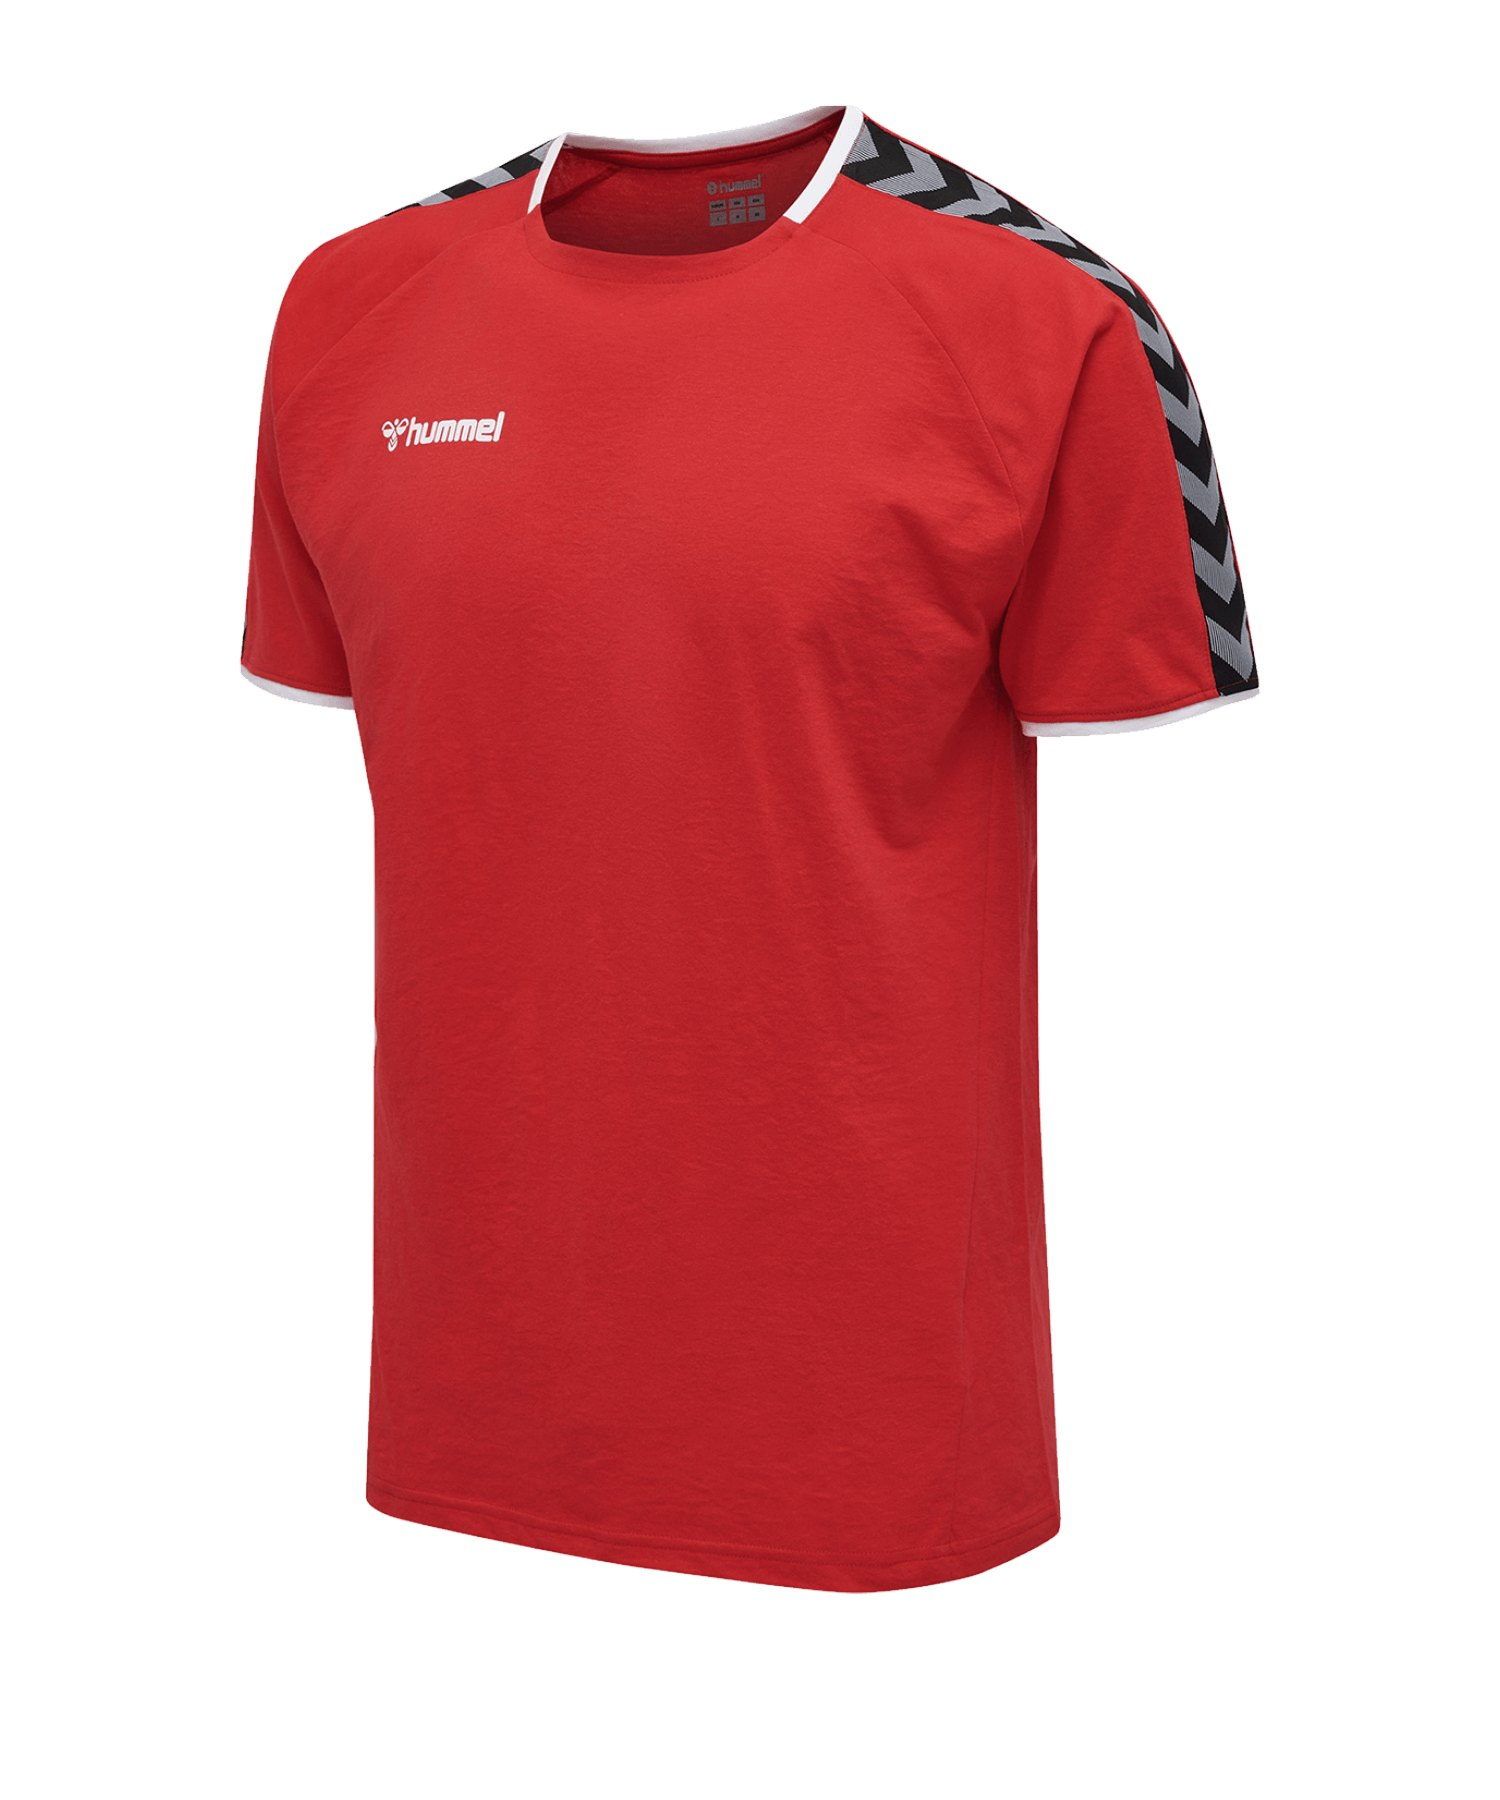 Hummel Authentic Trainingsshirt Rot F3062 - rot